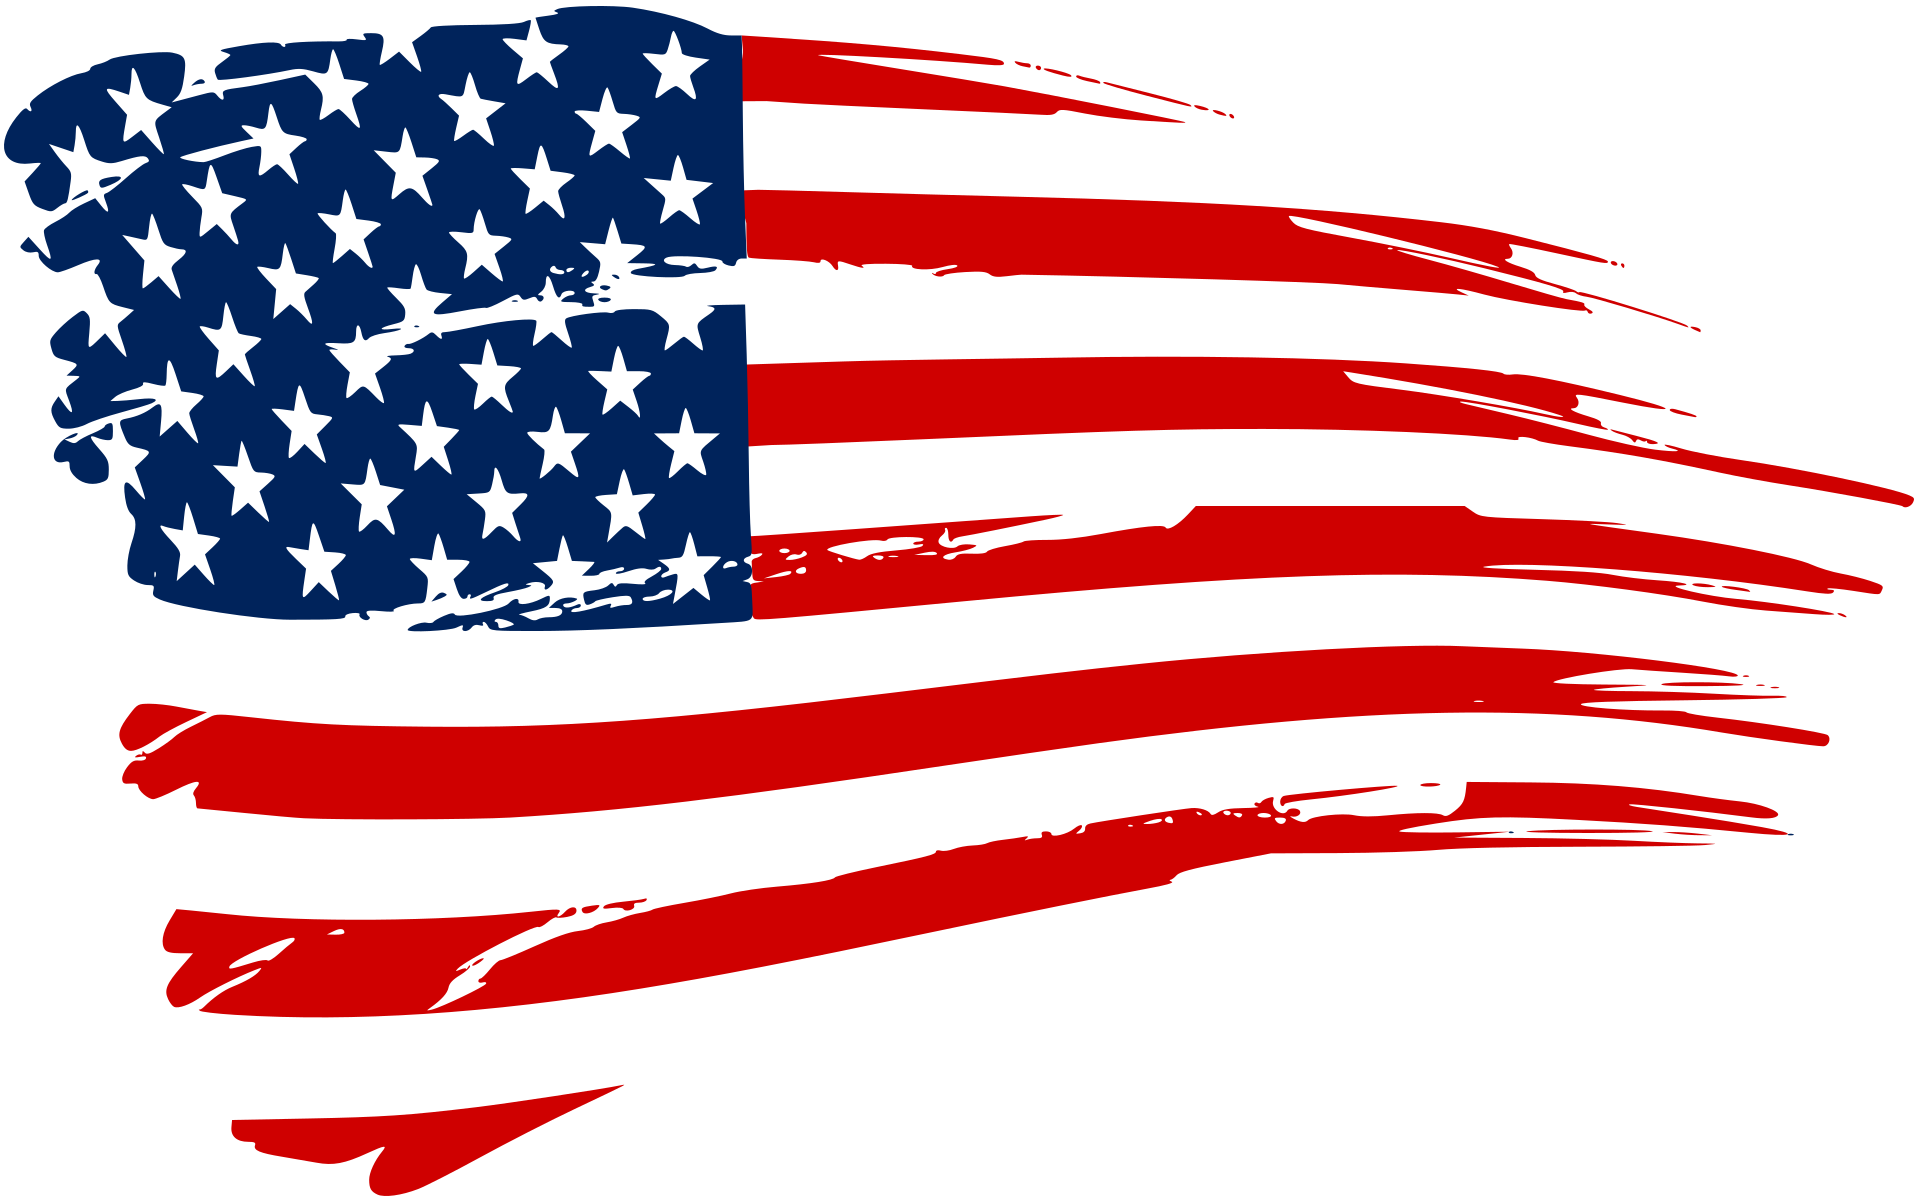 American Flag PNG Transparent - 164421